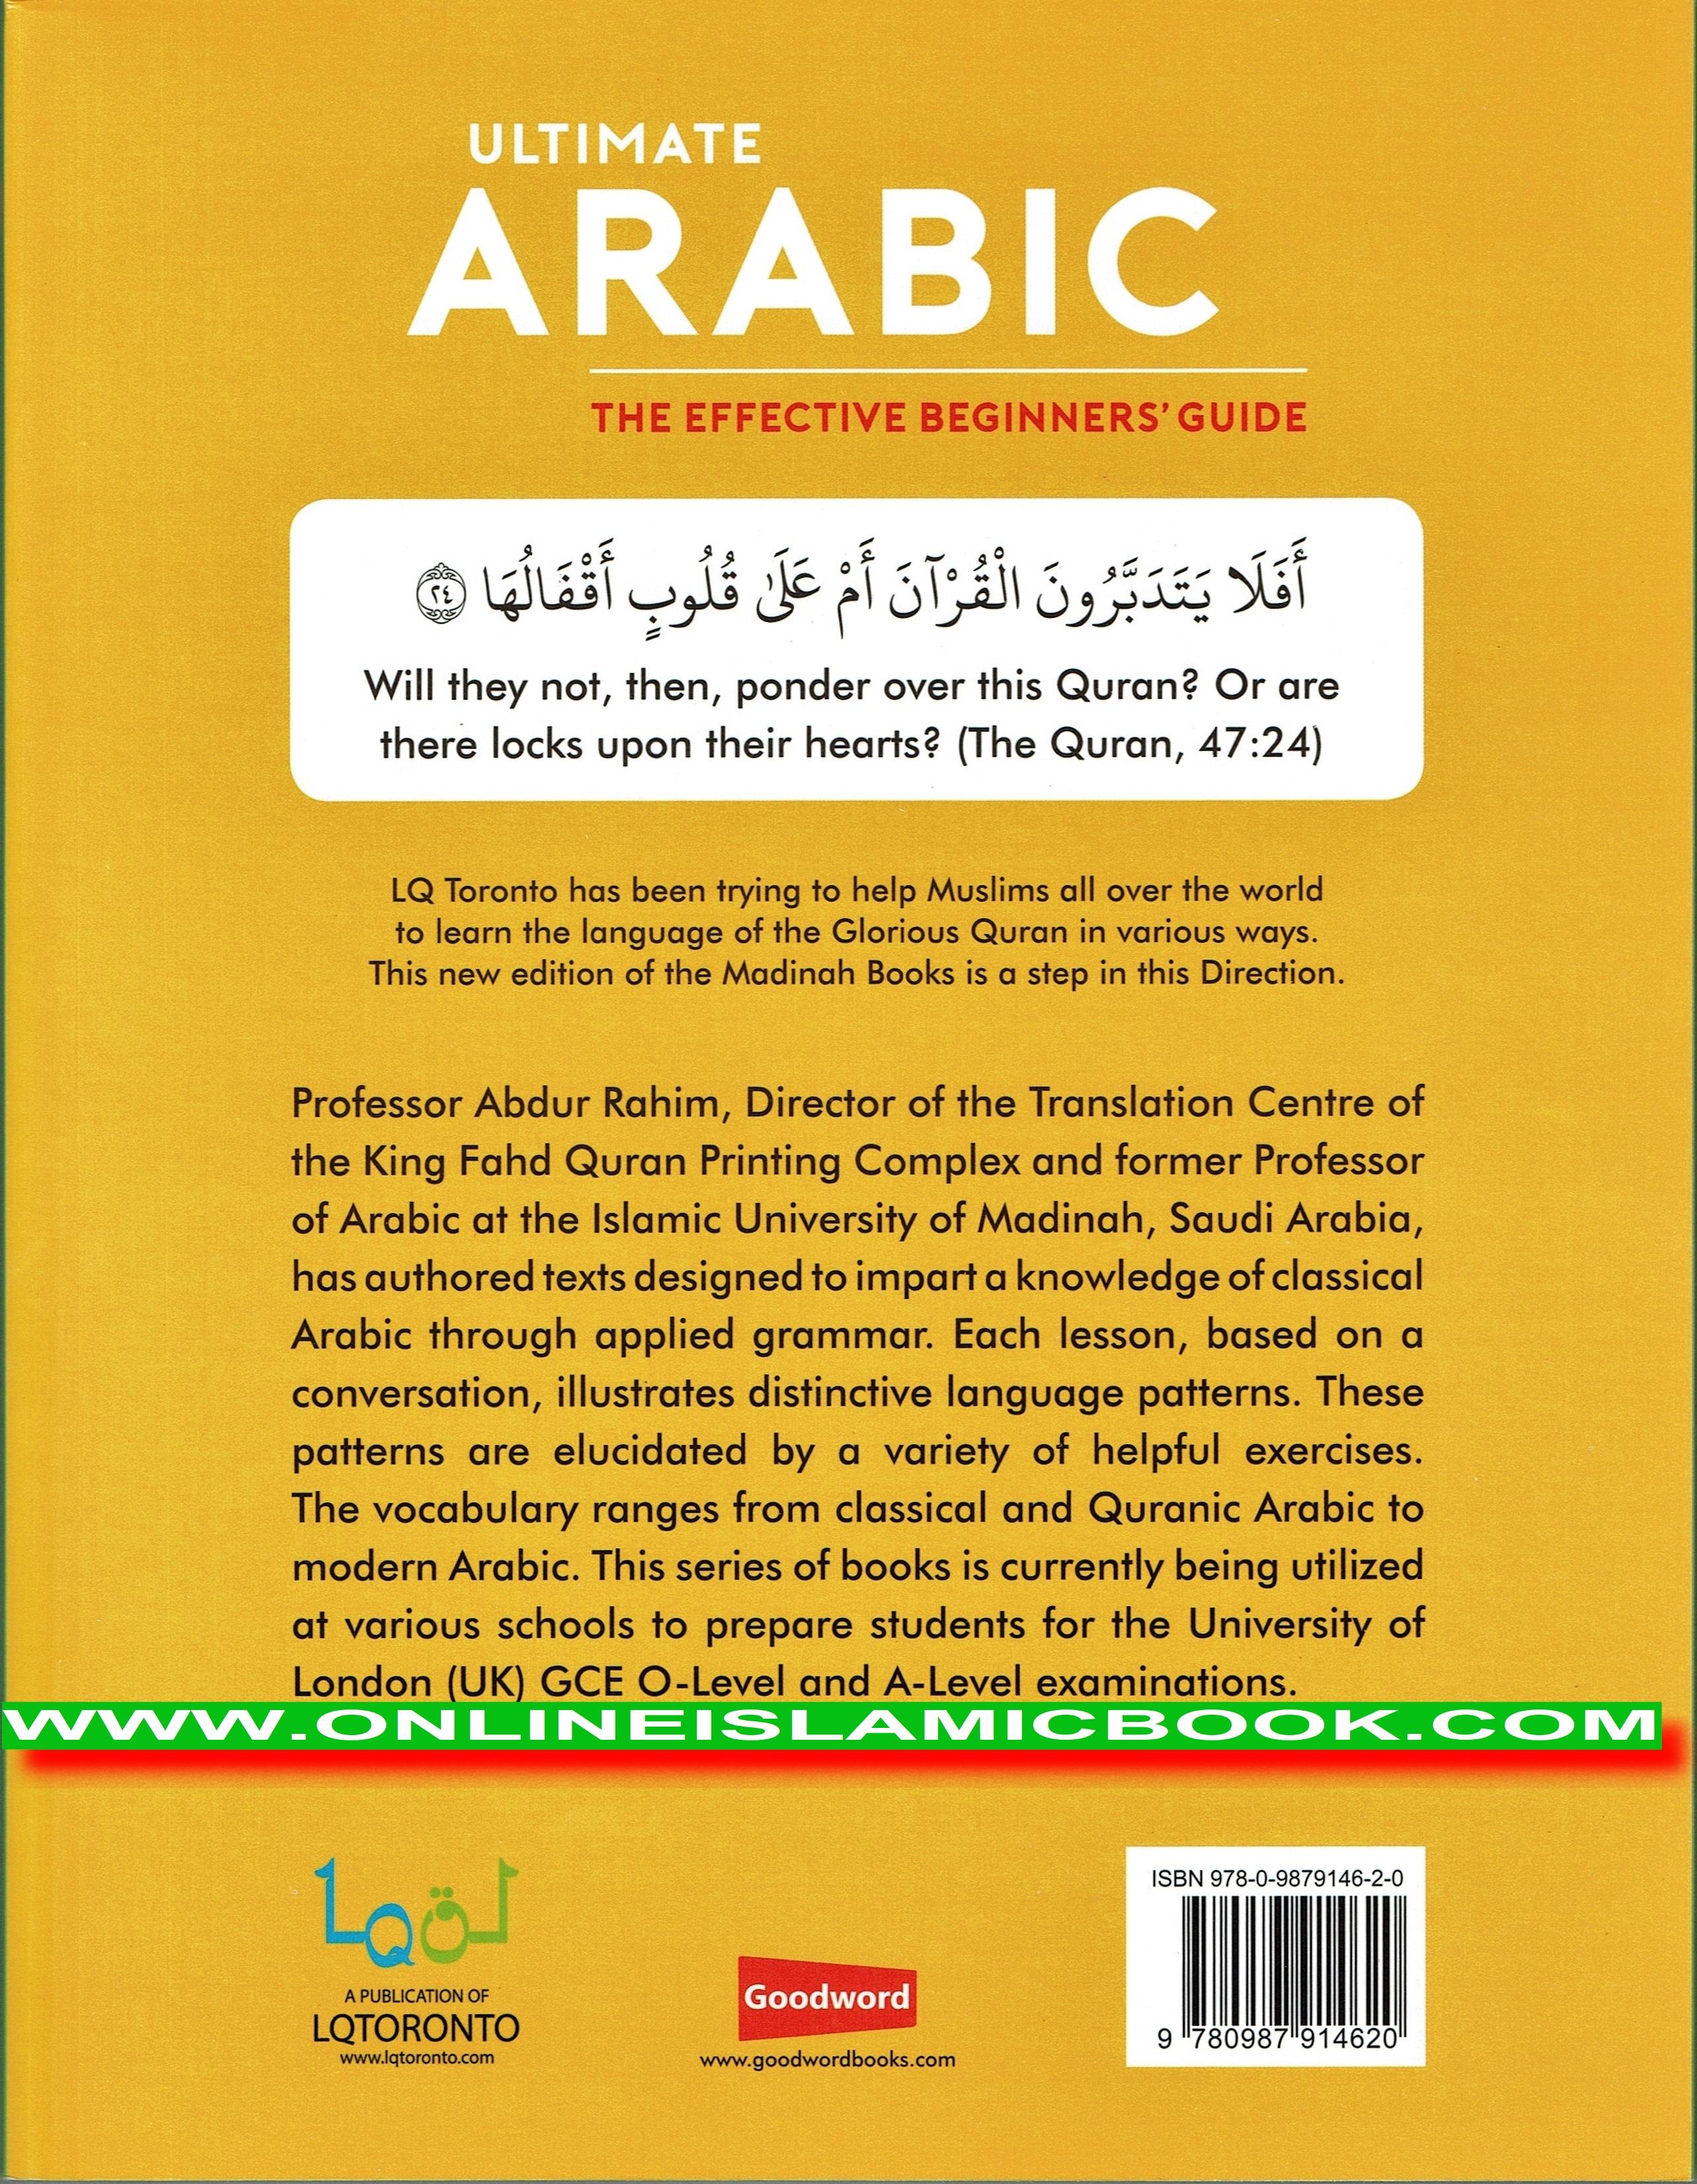 ultimate-arabic-course-book-1-2-.jpg